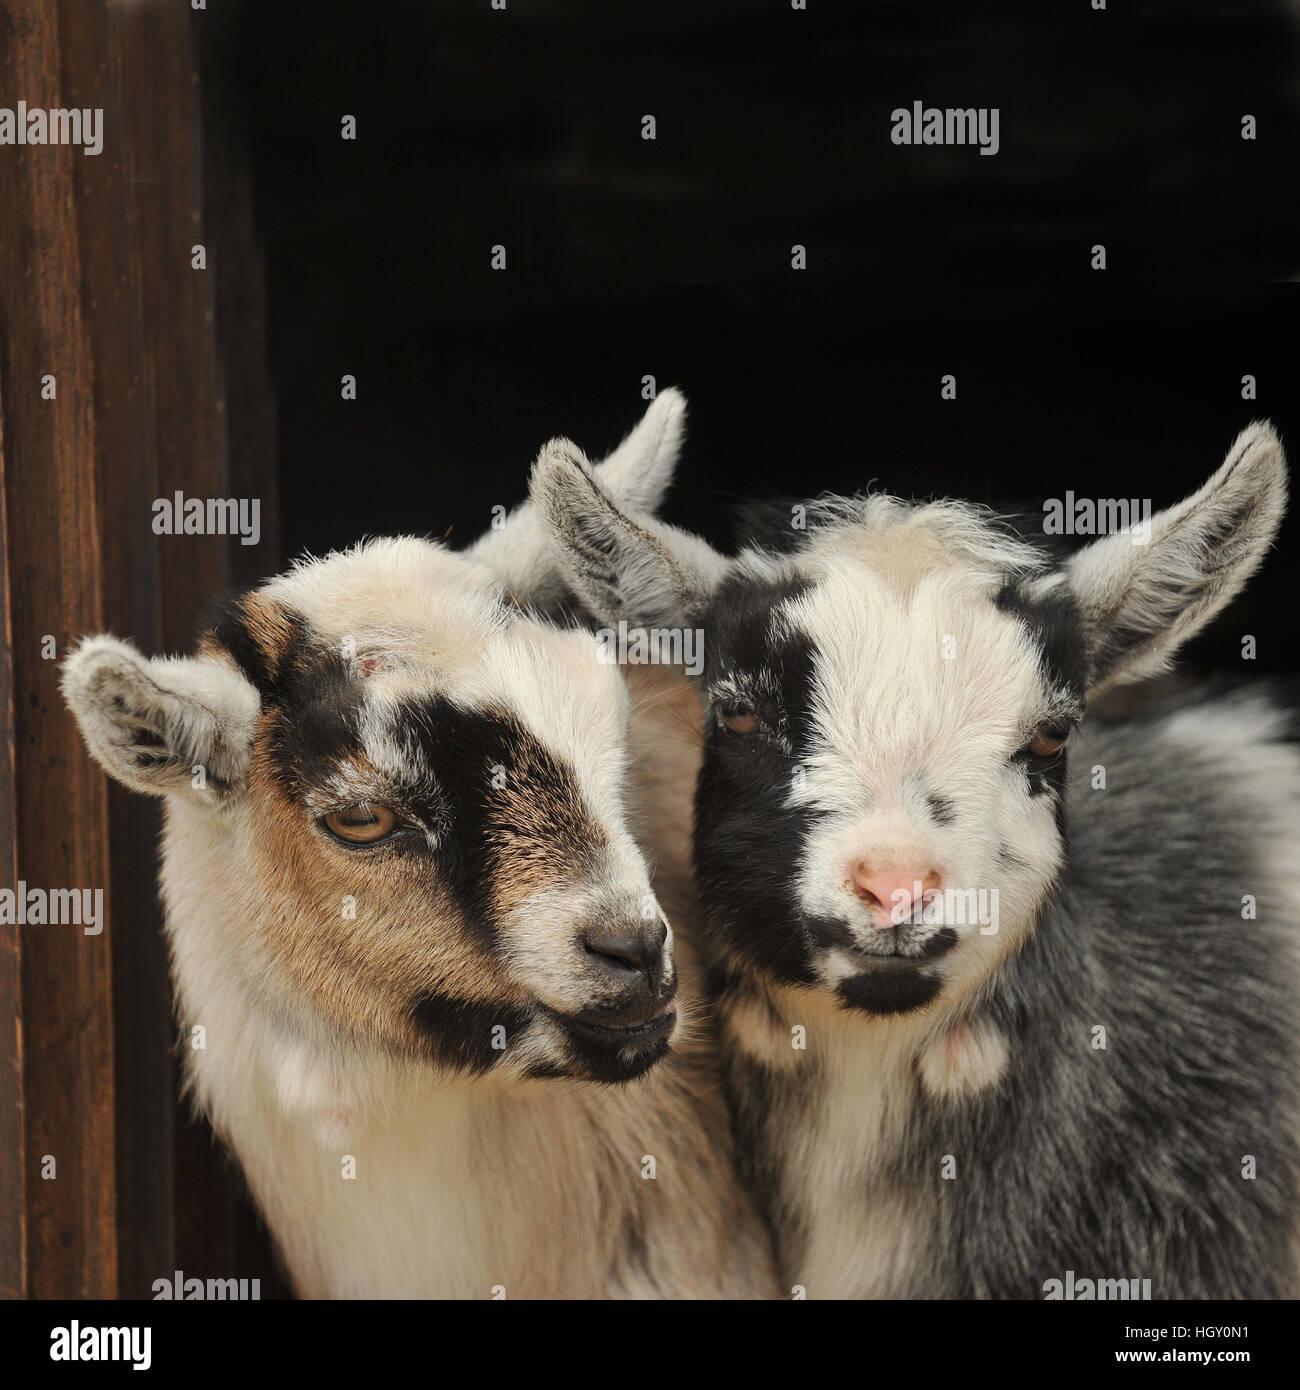 pygmy goat kids - Stock Image